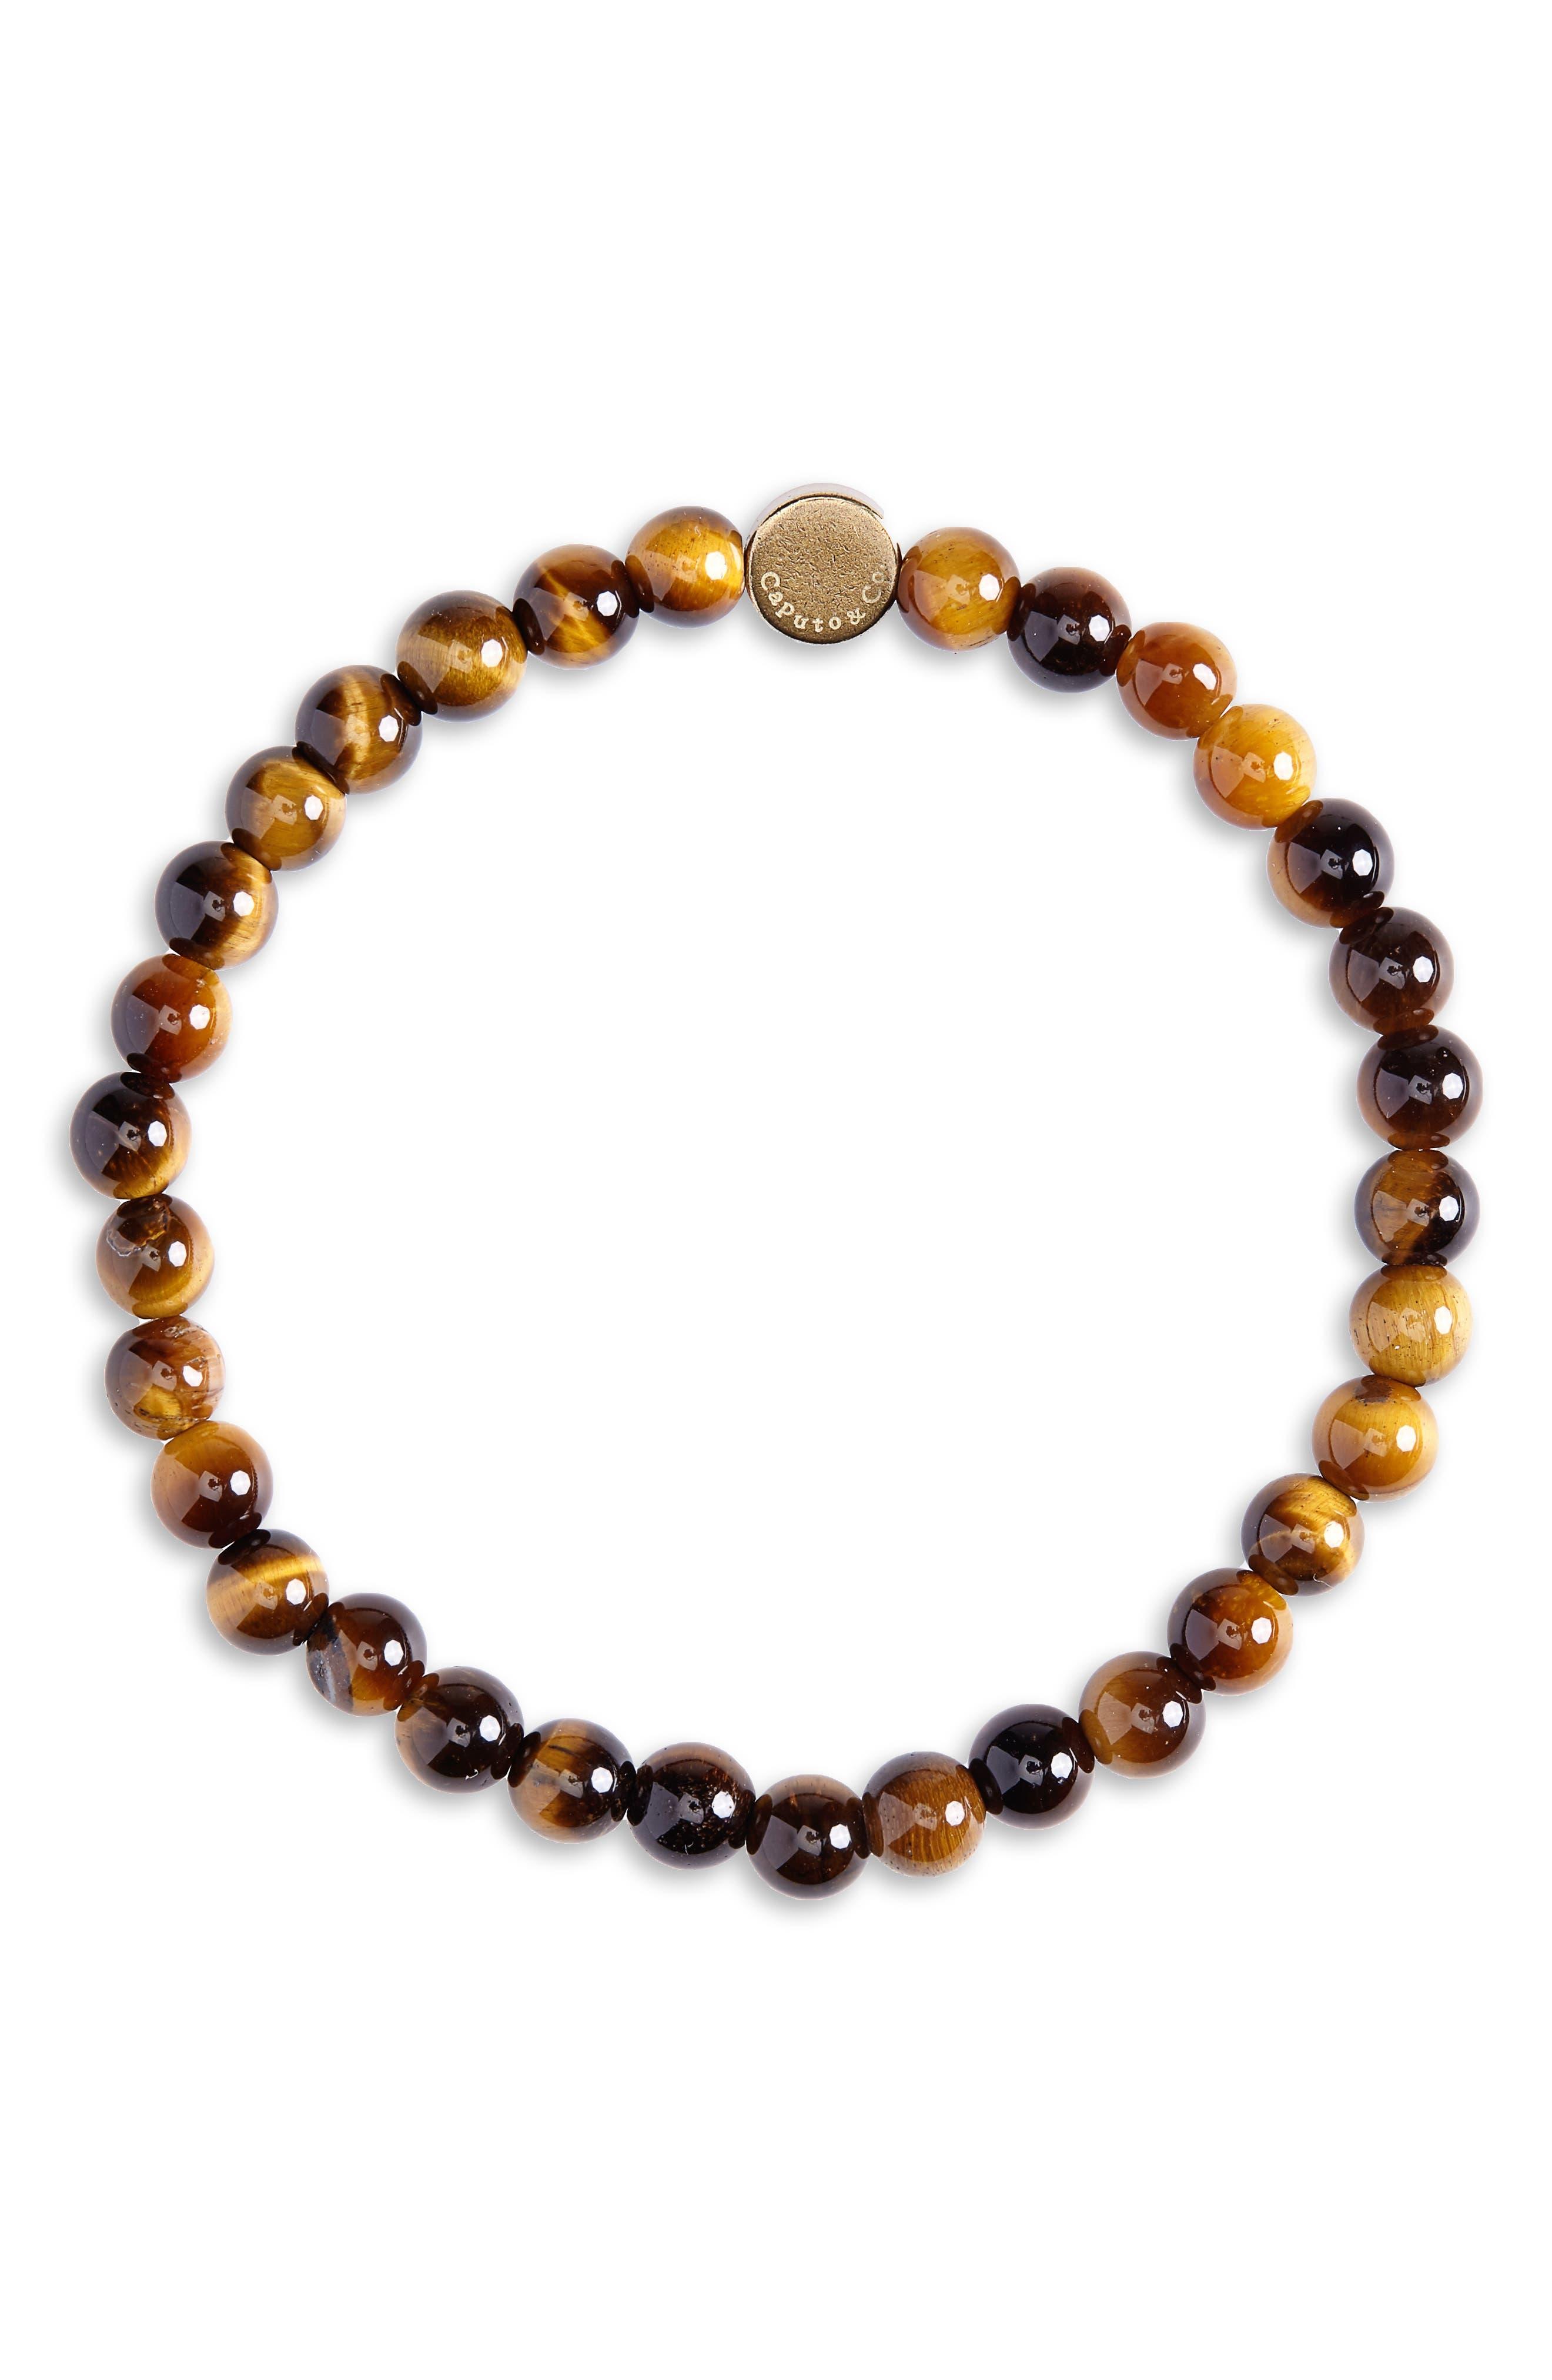 CAPUTO & CO. Stone Bead Bracelet in Yellow Tiger Eye